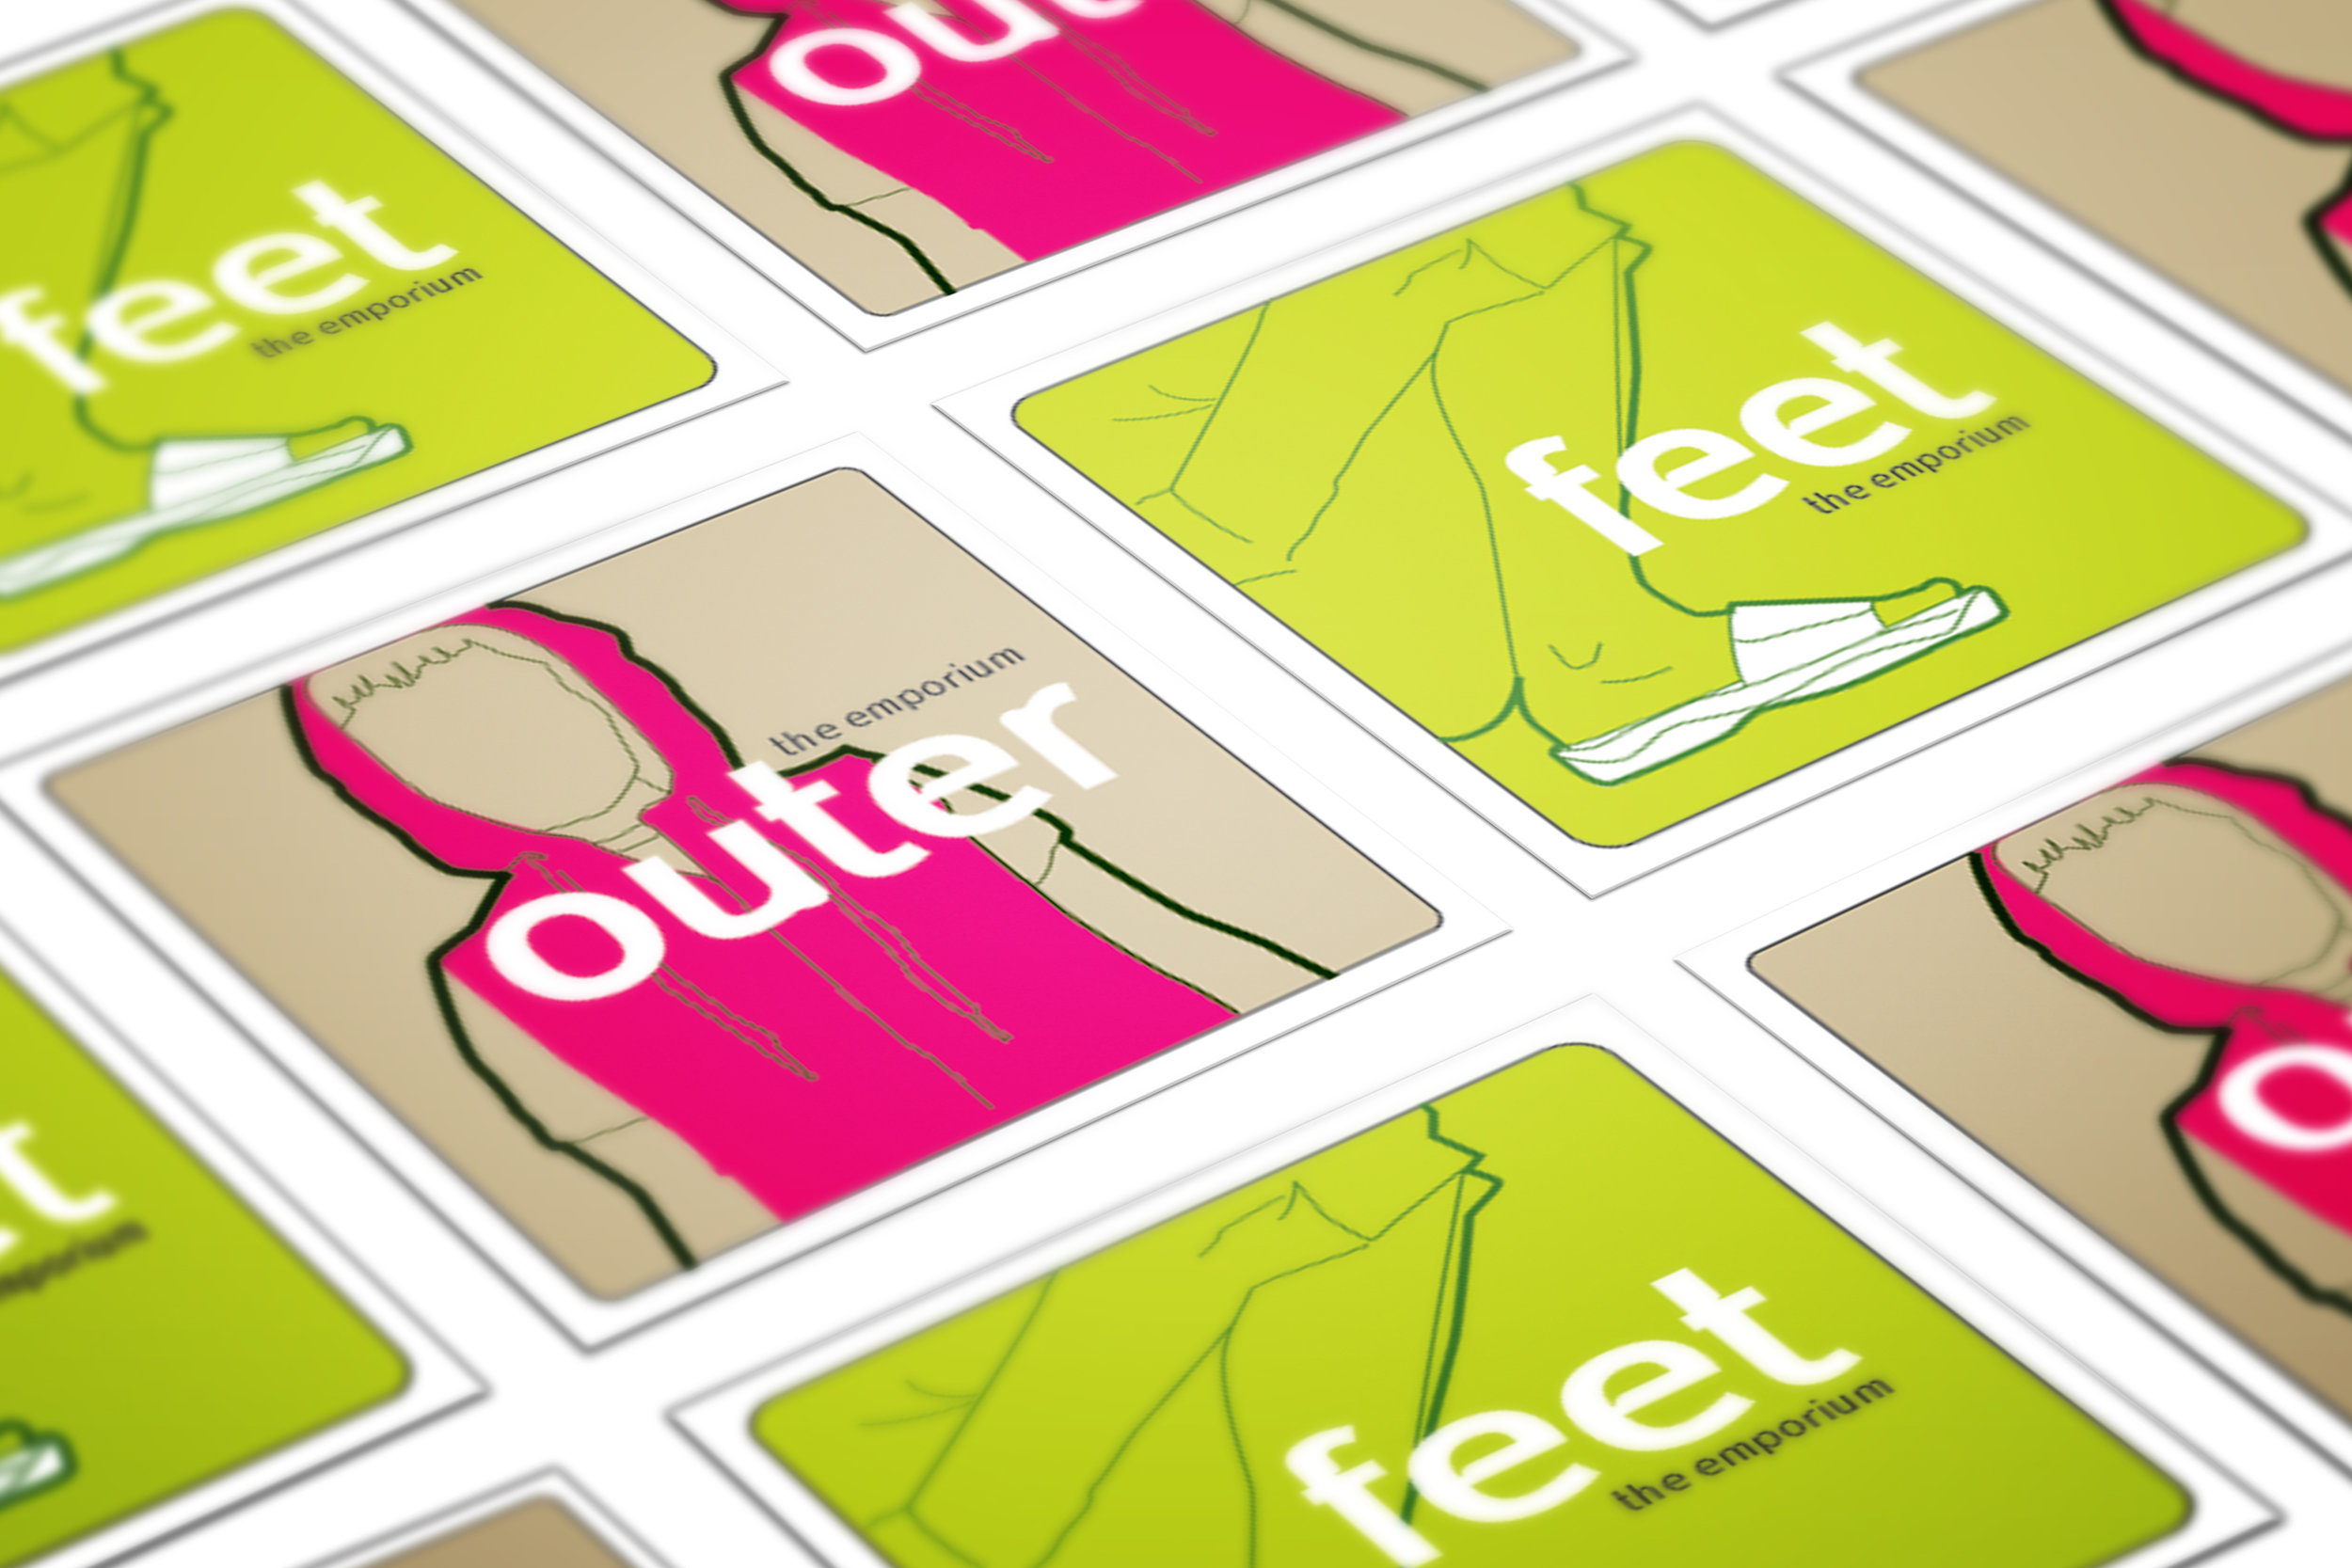 Emporium Business cards 2.jpg